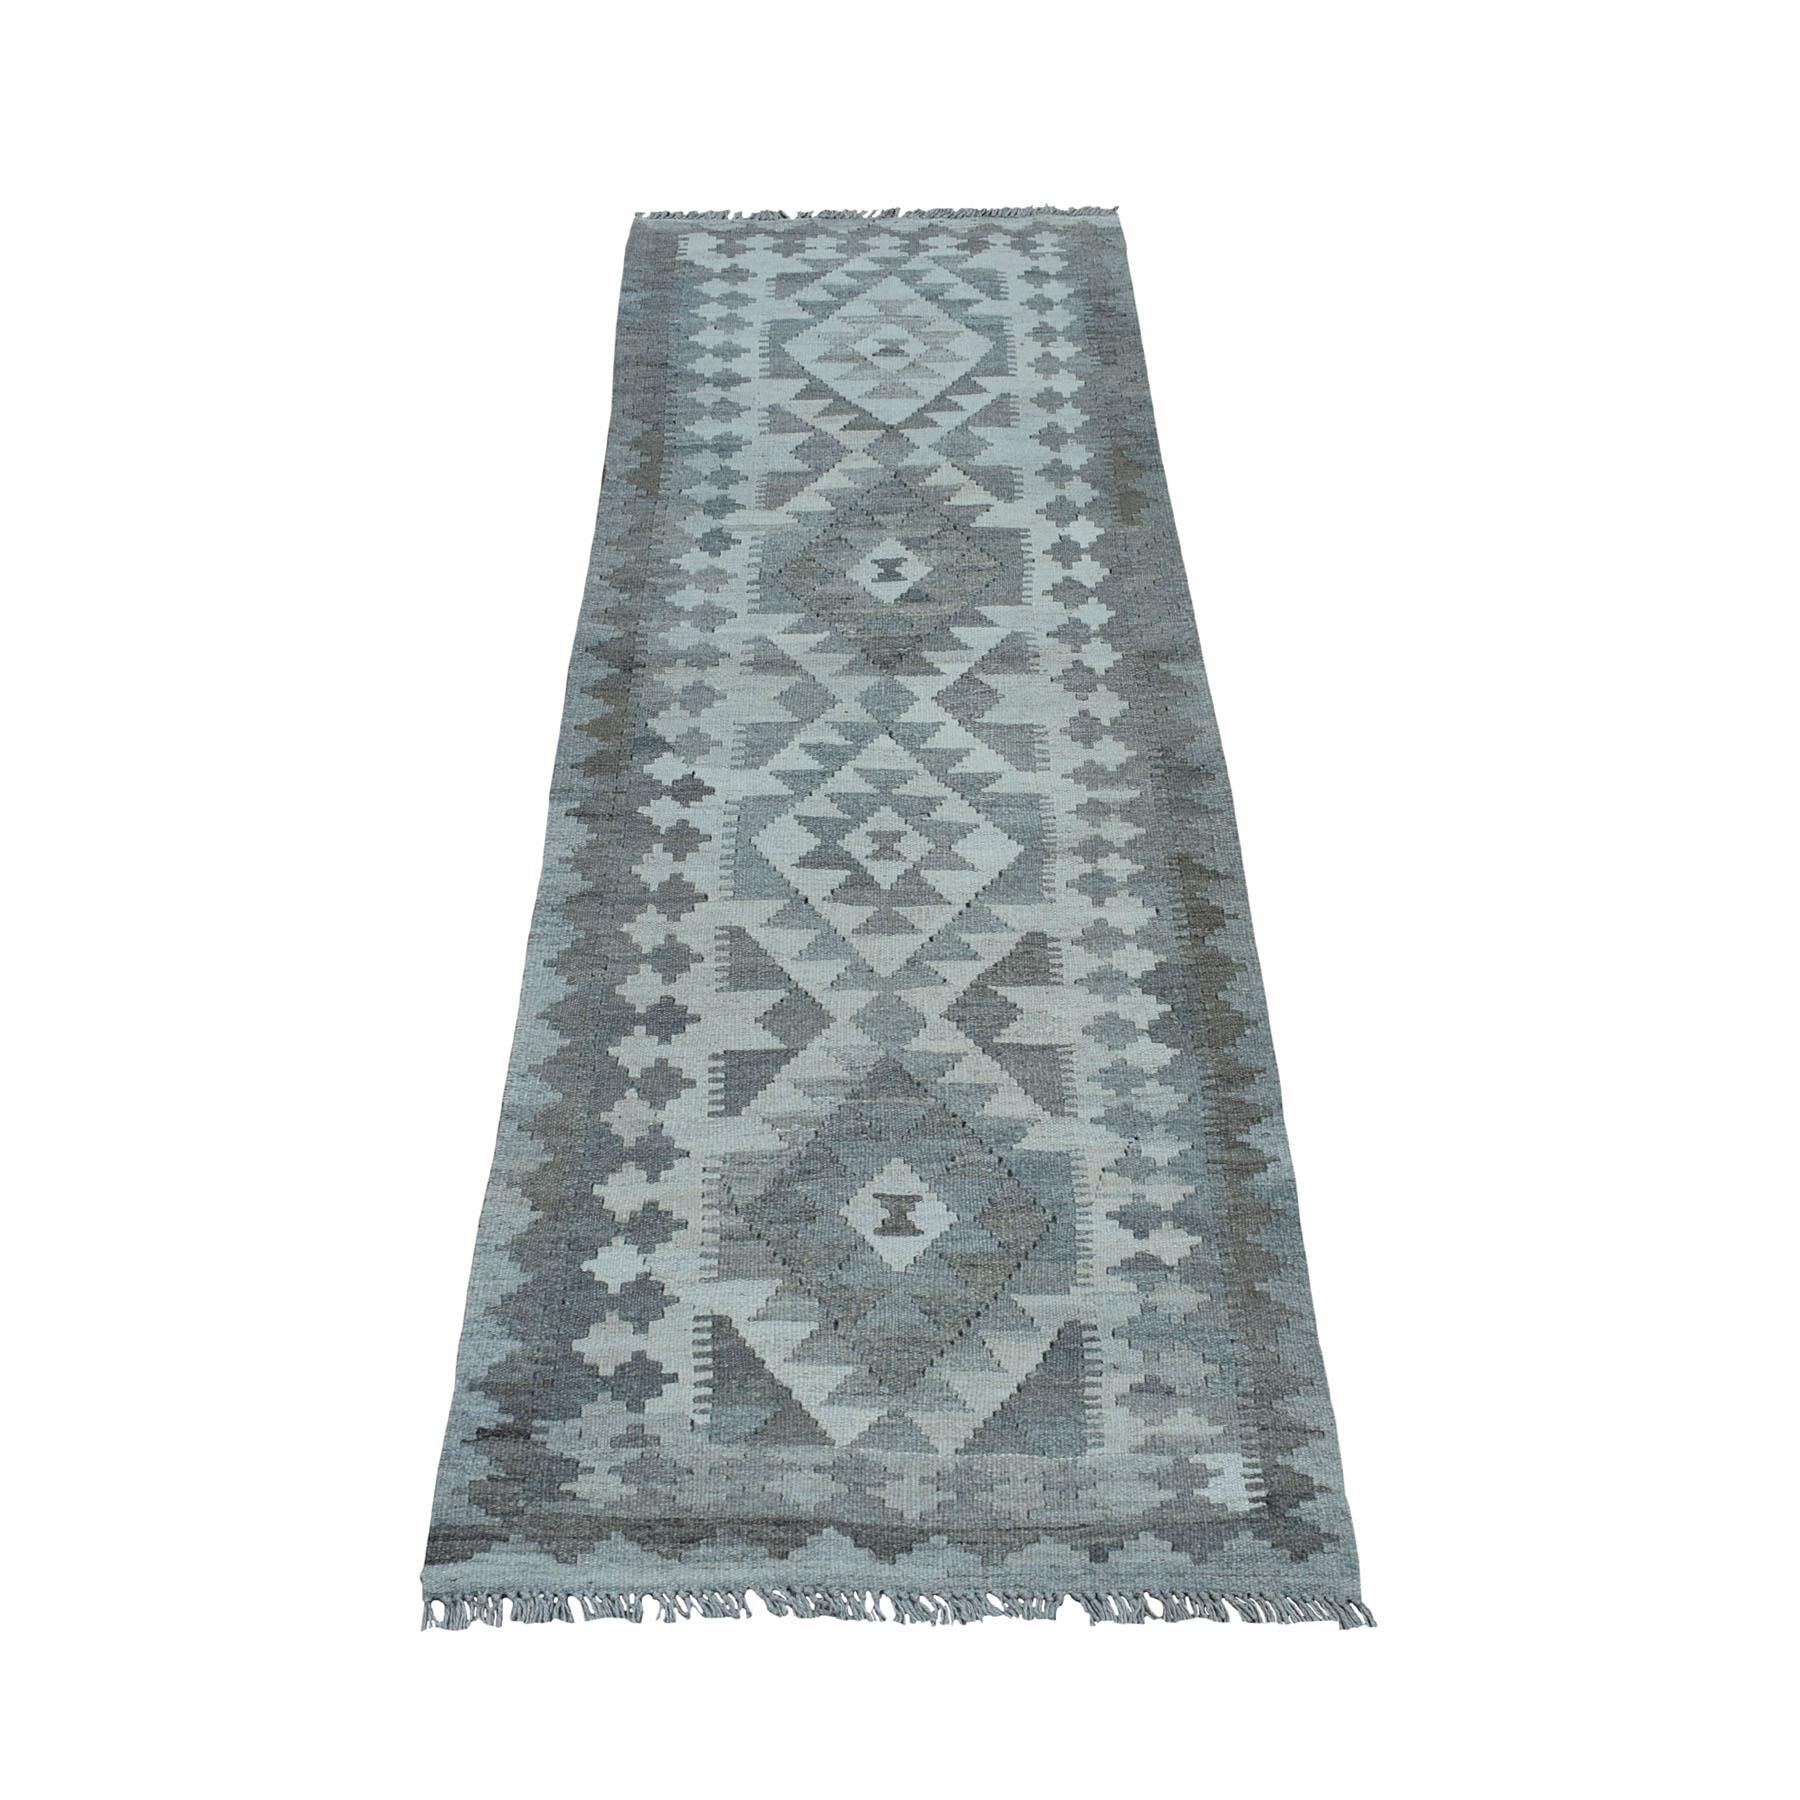 "2'3""x6'5"" Undyed Natural Wool Afghan Kilim Reversible Hand Woven Runner Oriental Rug 53070"